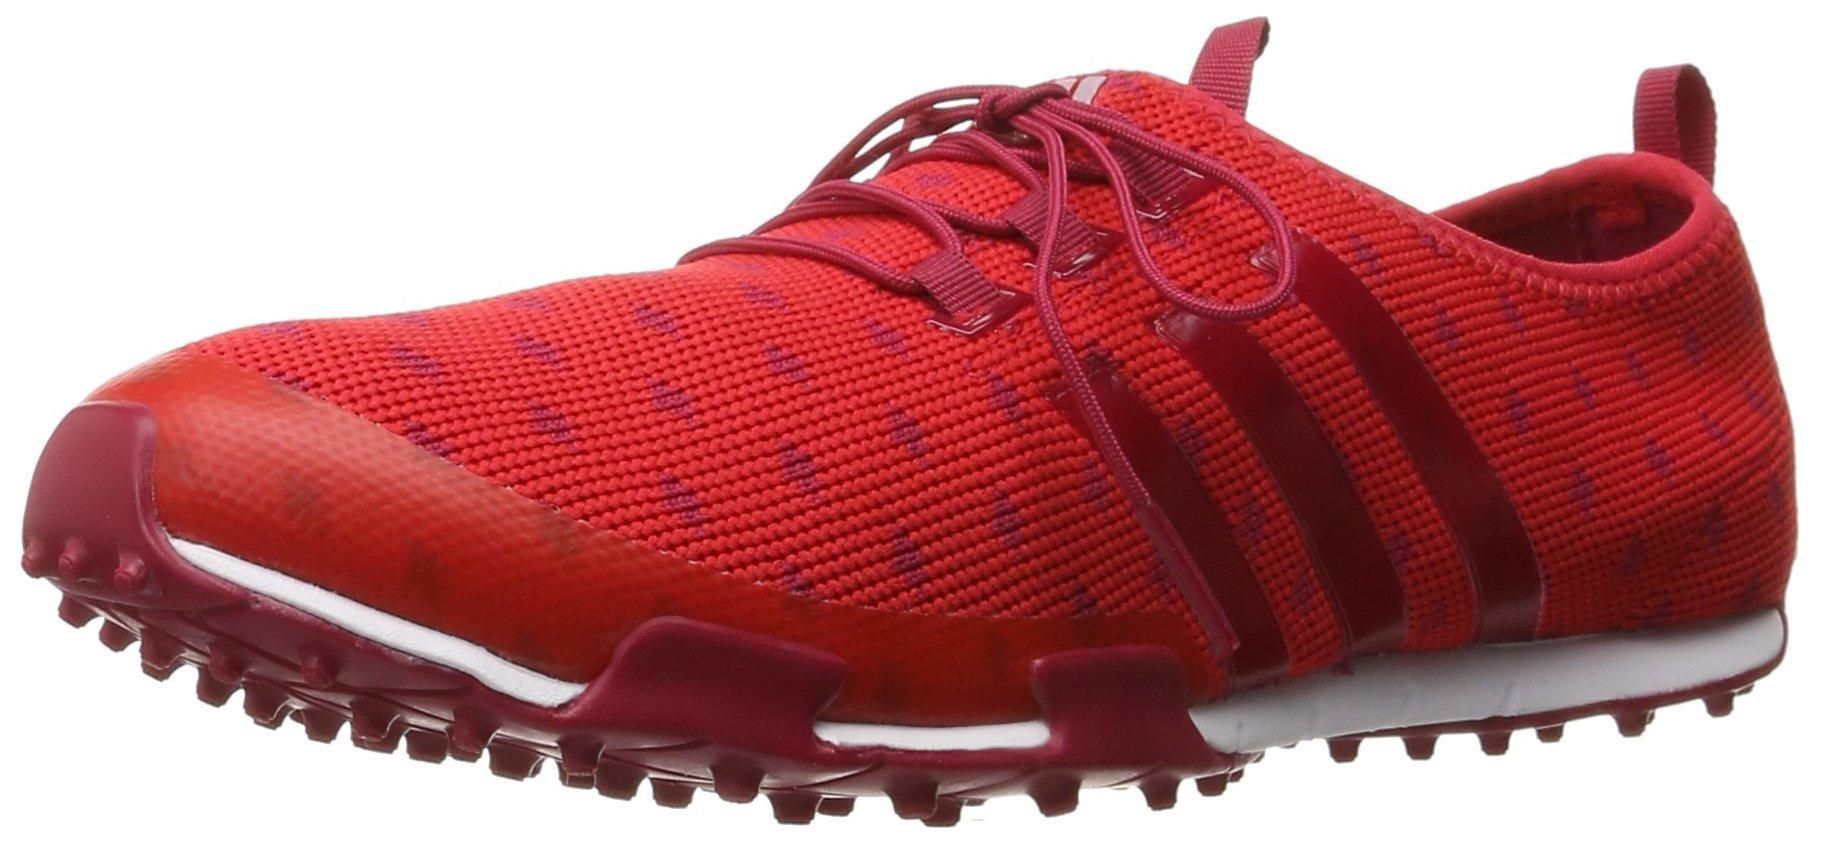 adidas Women's Ballerina Primeknit Golf Shoe, Ray Red/Unity Pink/Unity Pink F, 8.5 M US